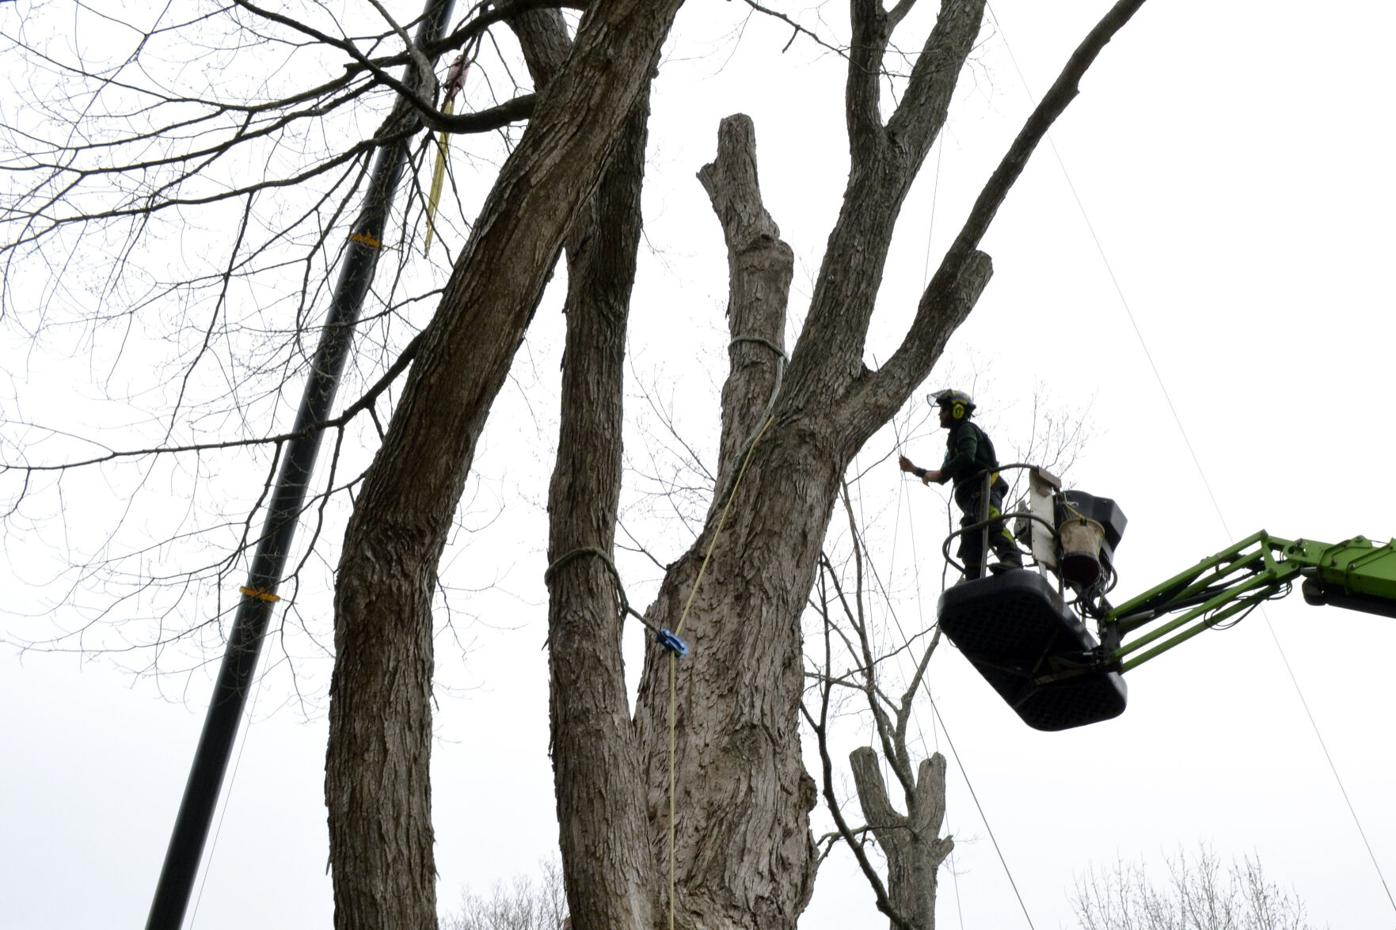 Big Tree No More